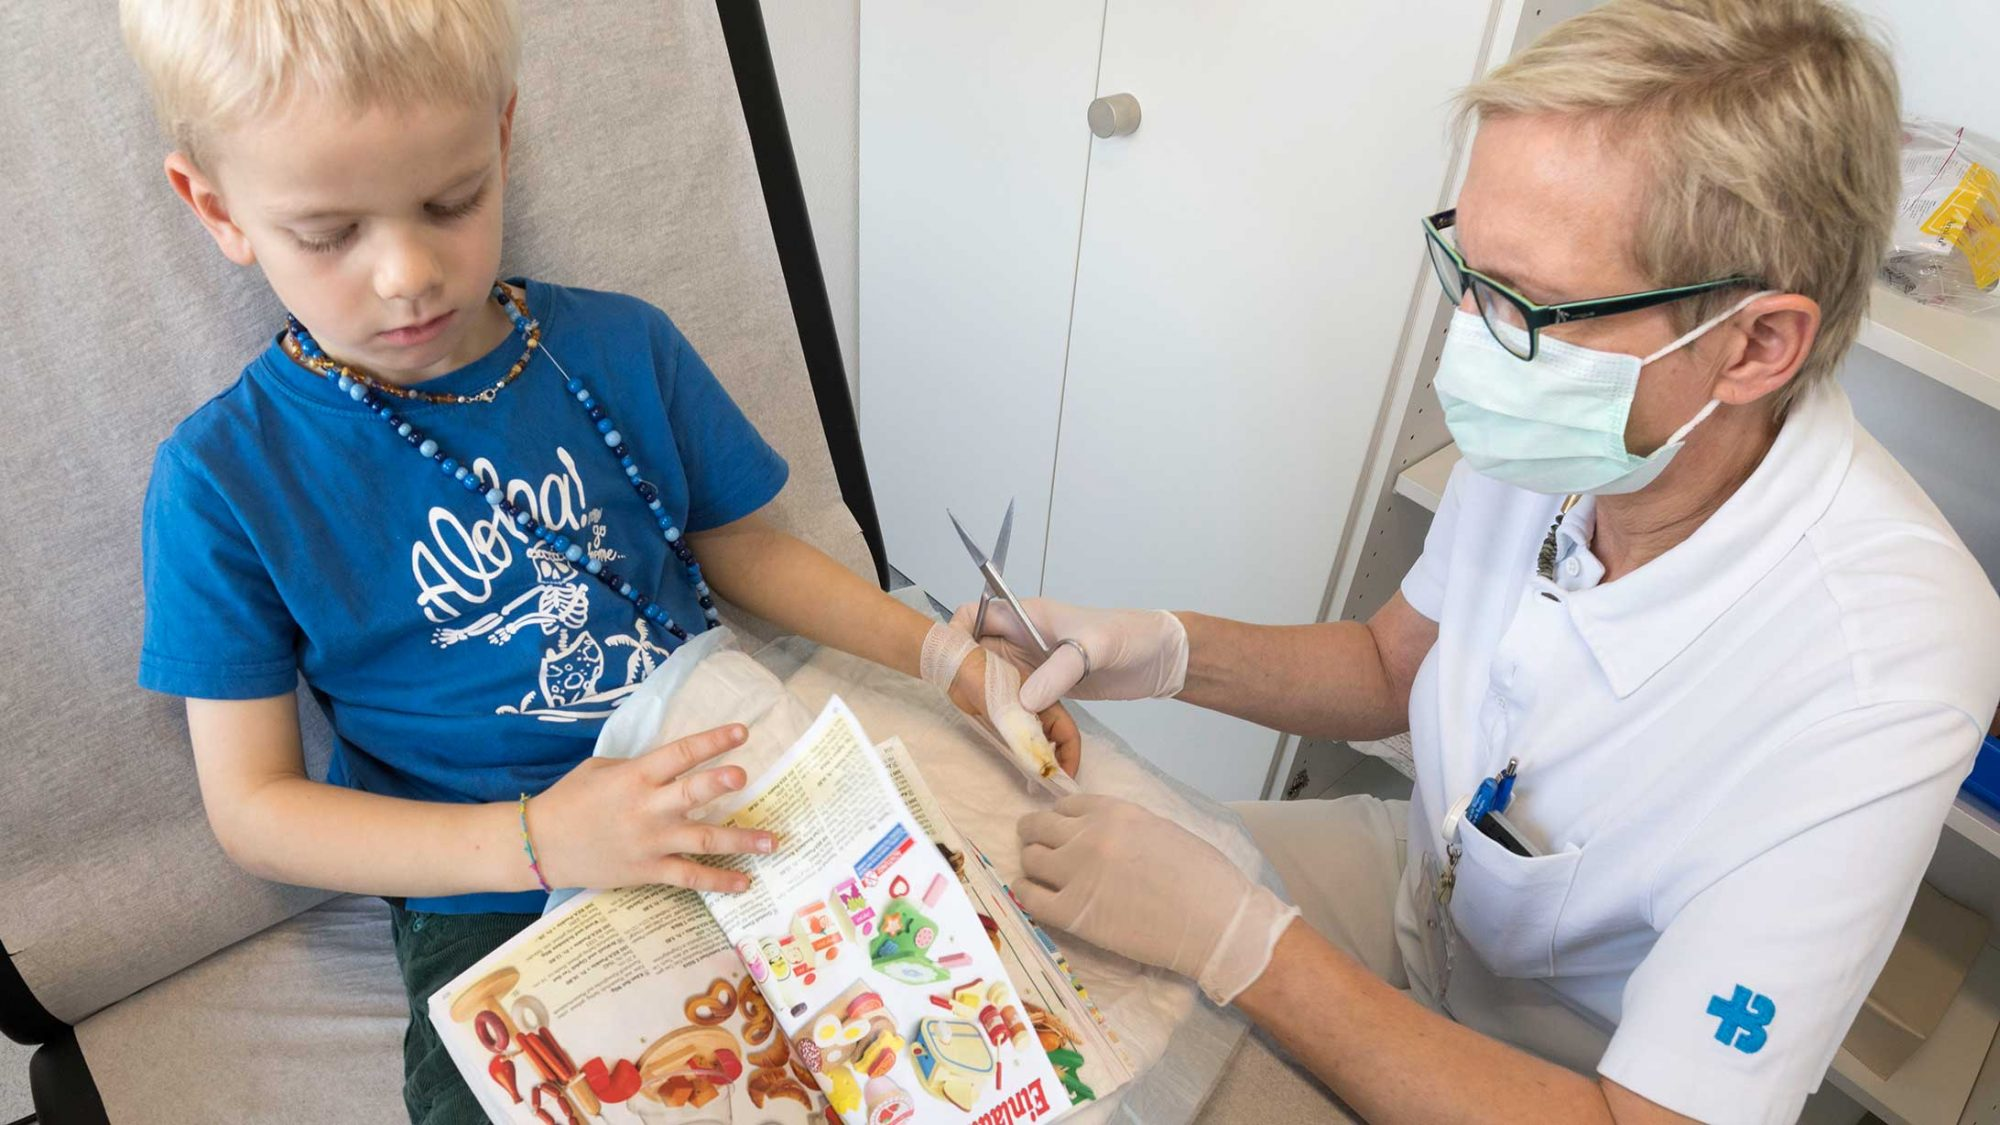 Notfall: Dr. Dörthe Harms Huser versorgt den Daumen eines kleinen Jungen.